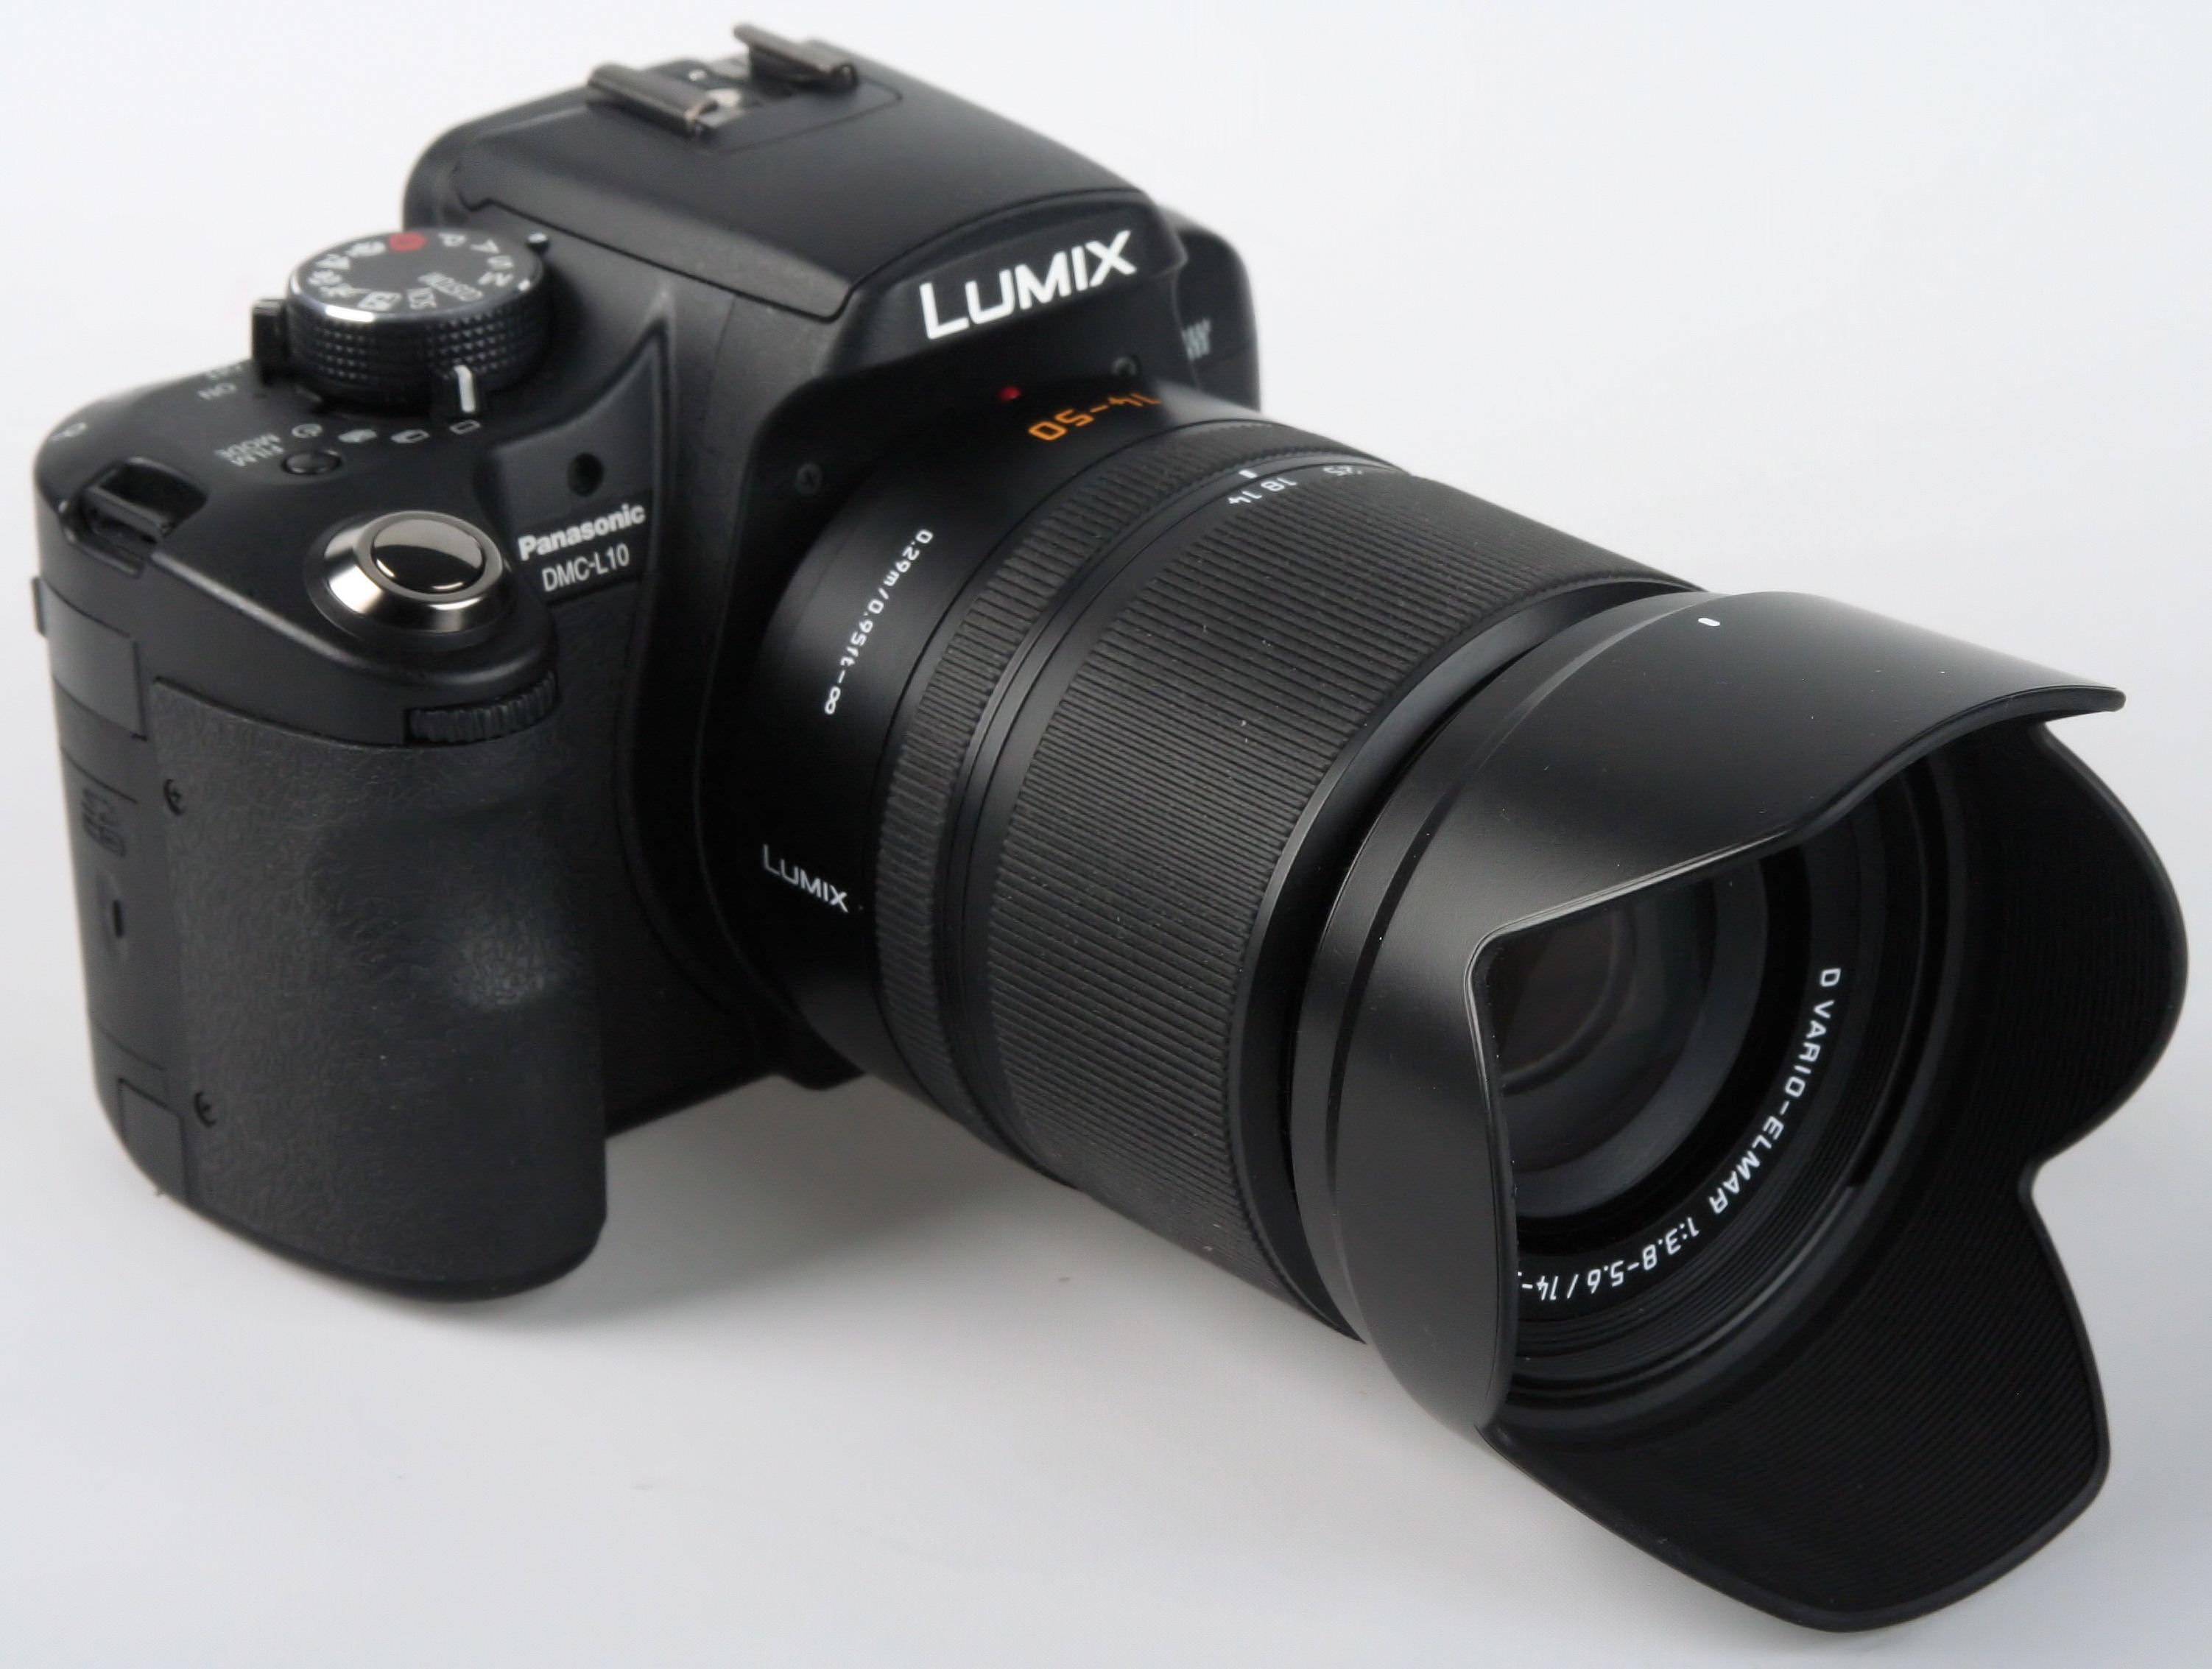 Panasonic DMC L10 Digital SLR Review